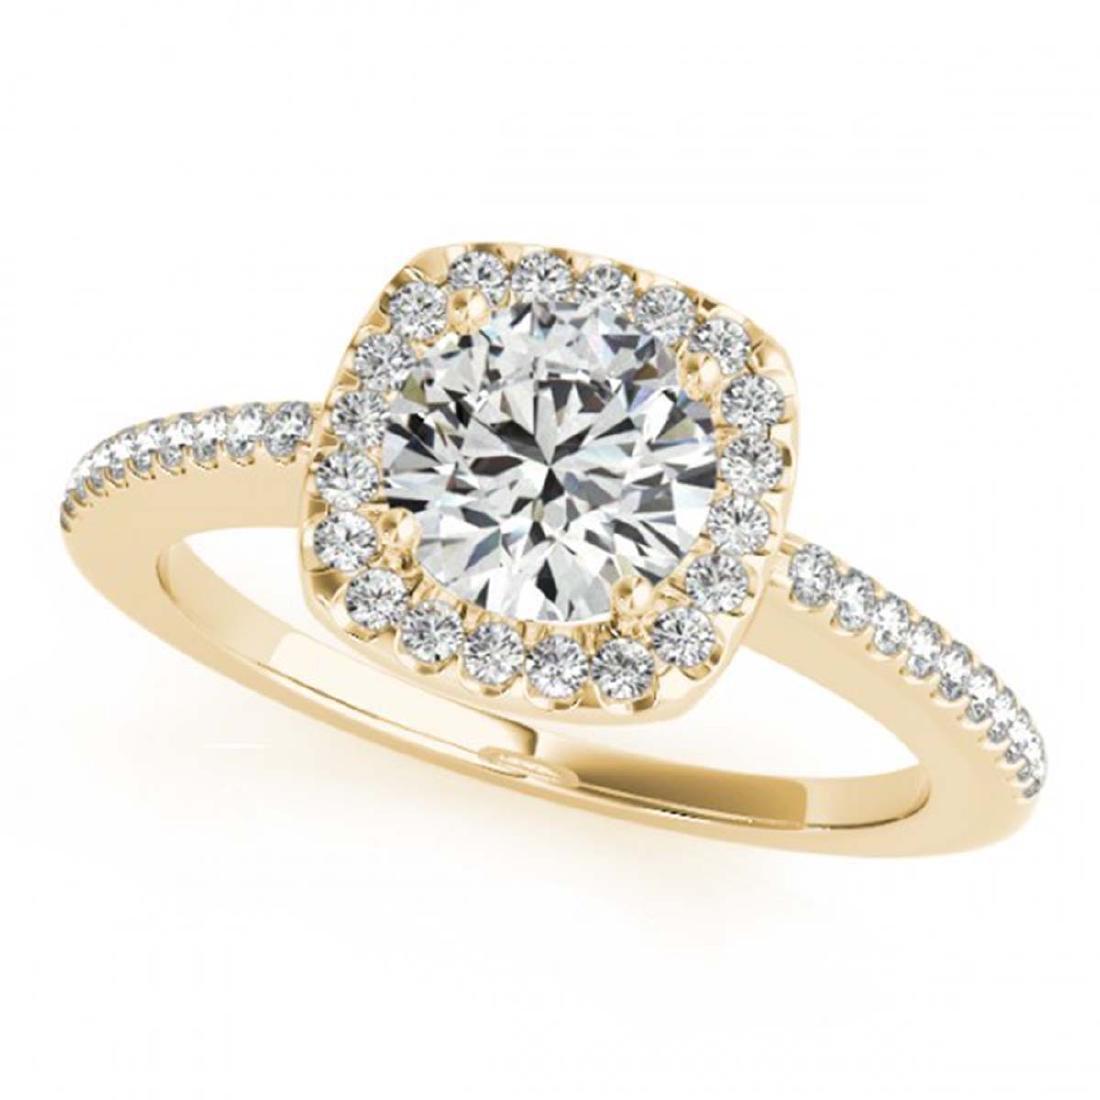 1.01 ctw VS/SI Diamond Halo Ring 18K Yellow Gold -